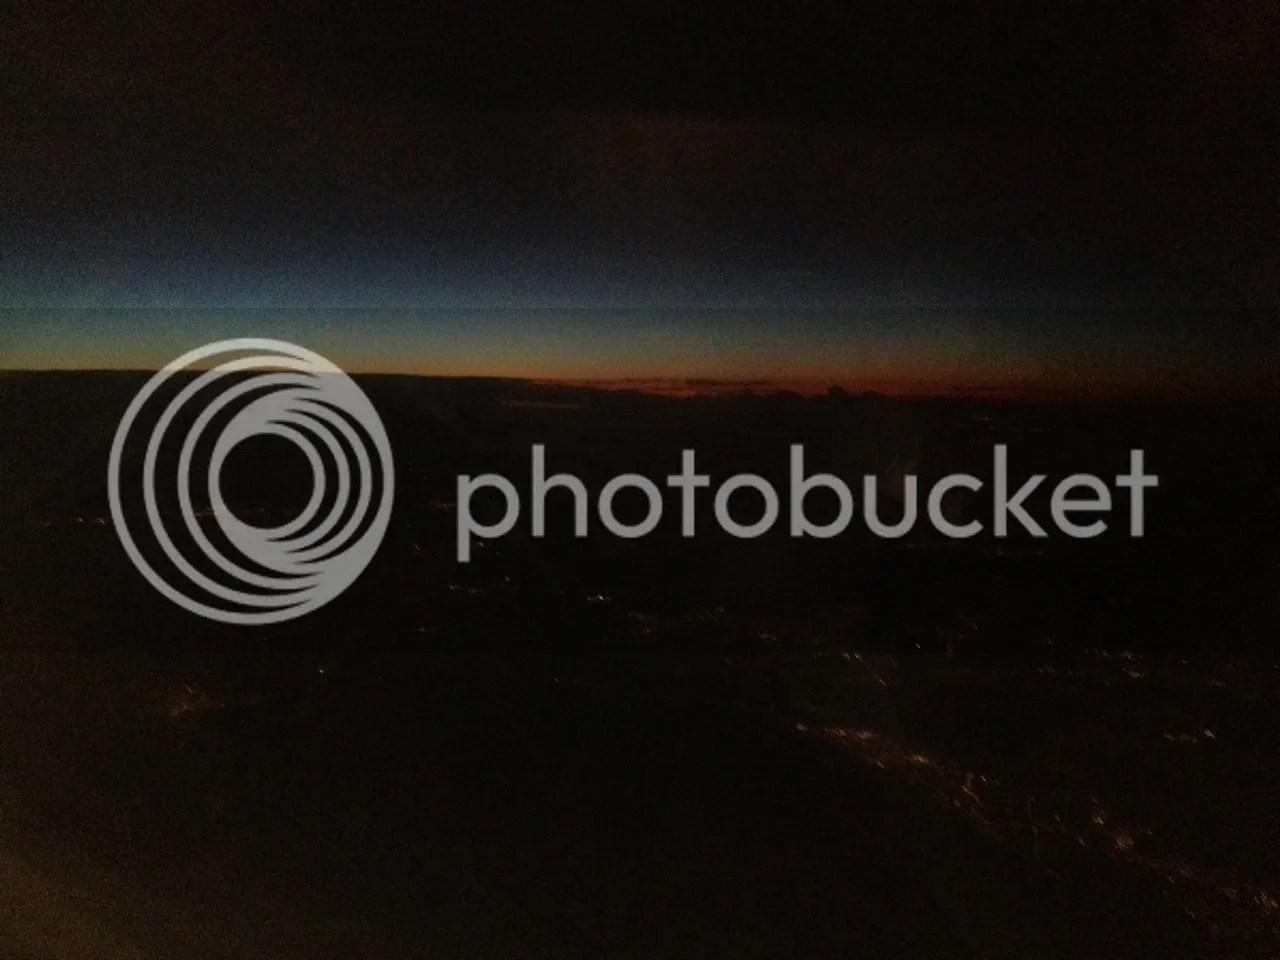 https://i1.wp.com/i181.photobucket.com/albums/x35/jwhite9185/Madrid/file-82.jpg